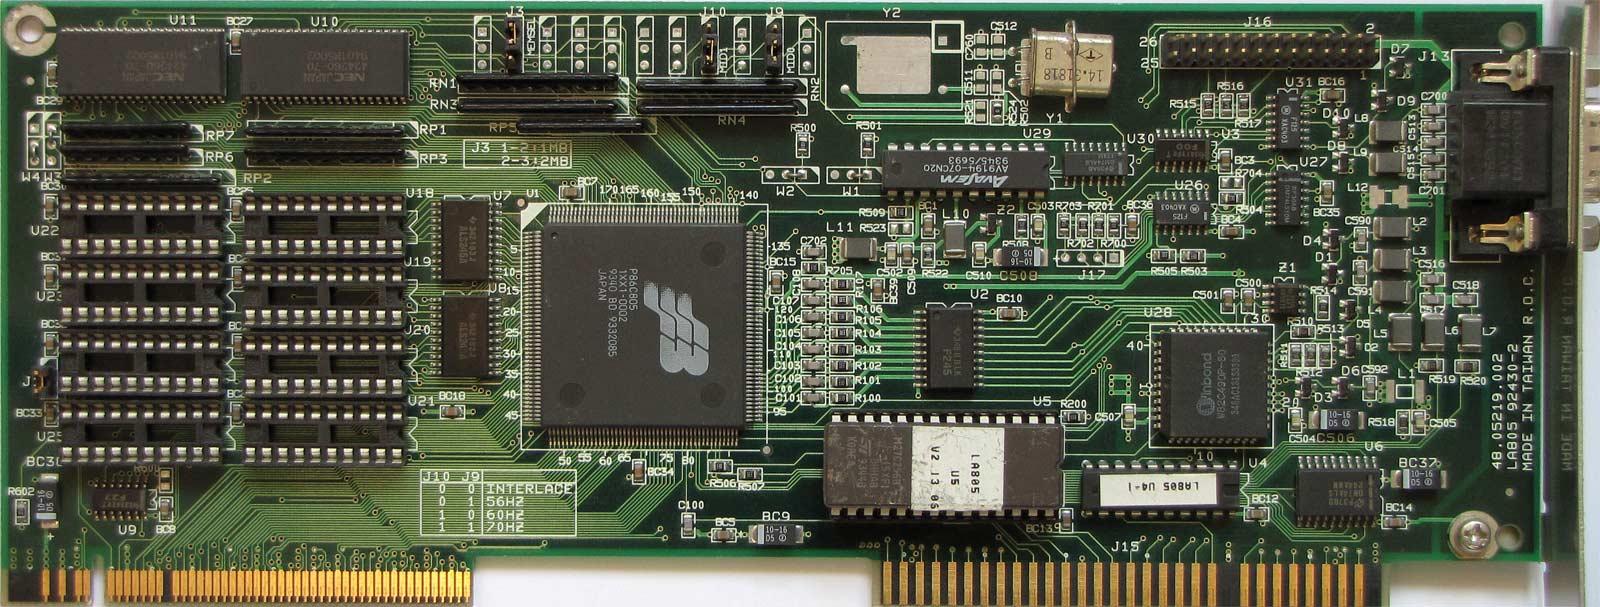 SMX8099